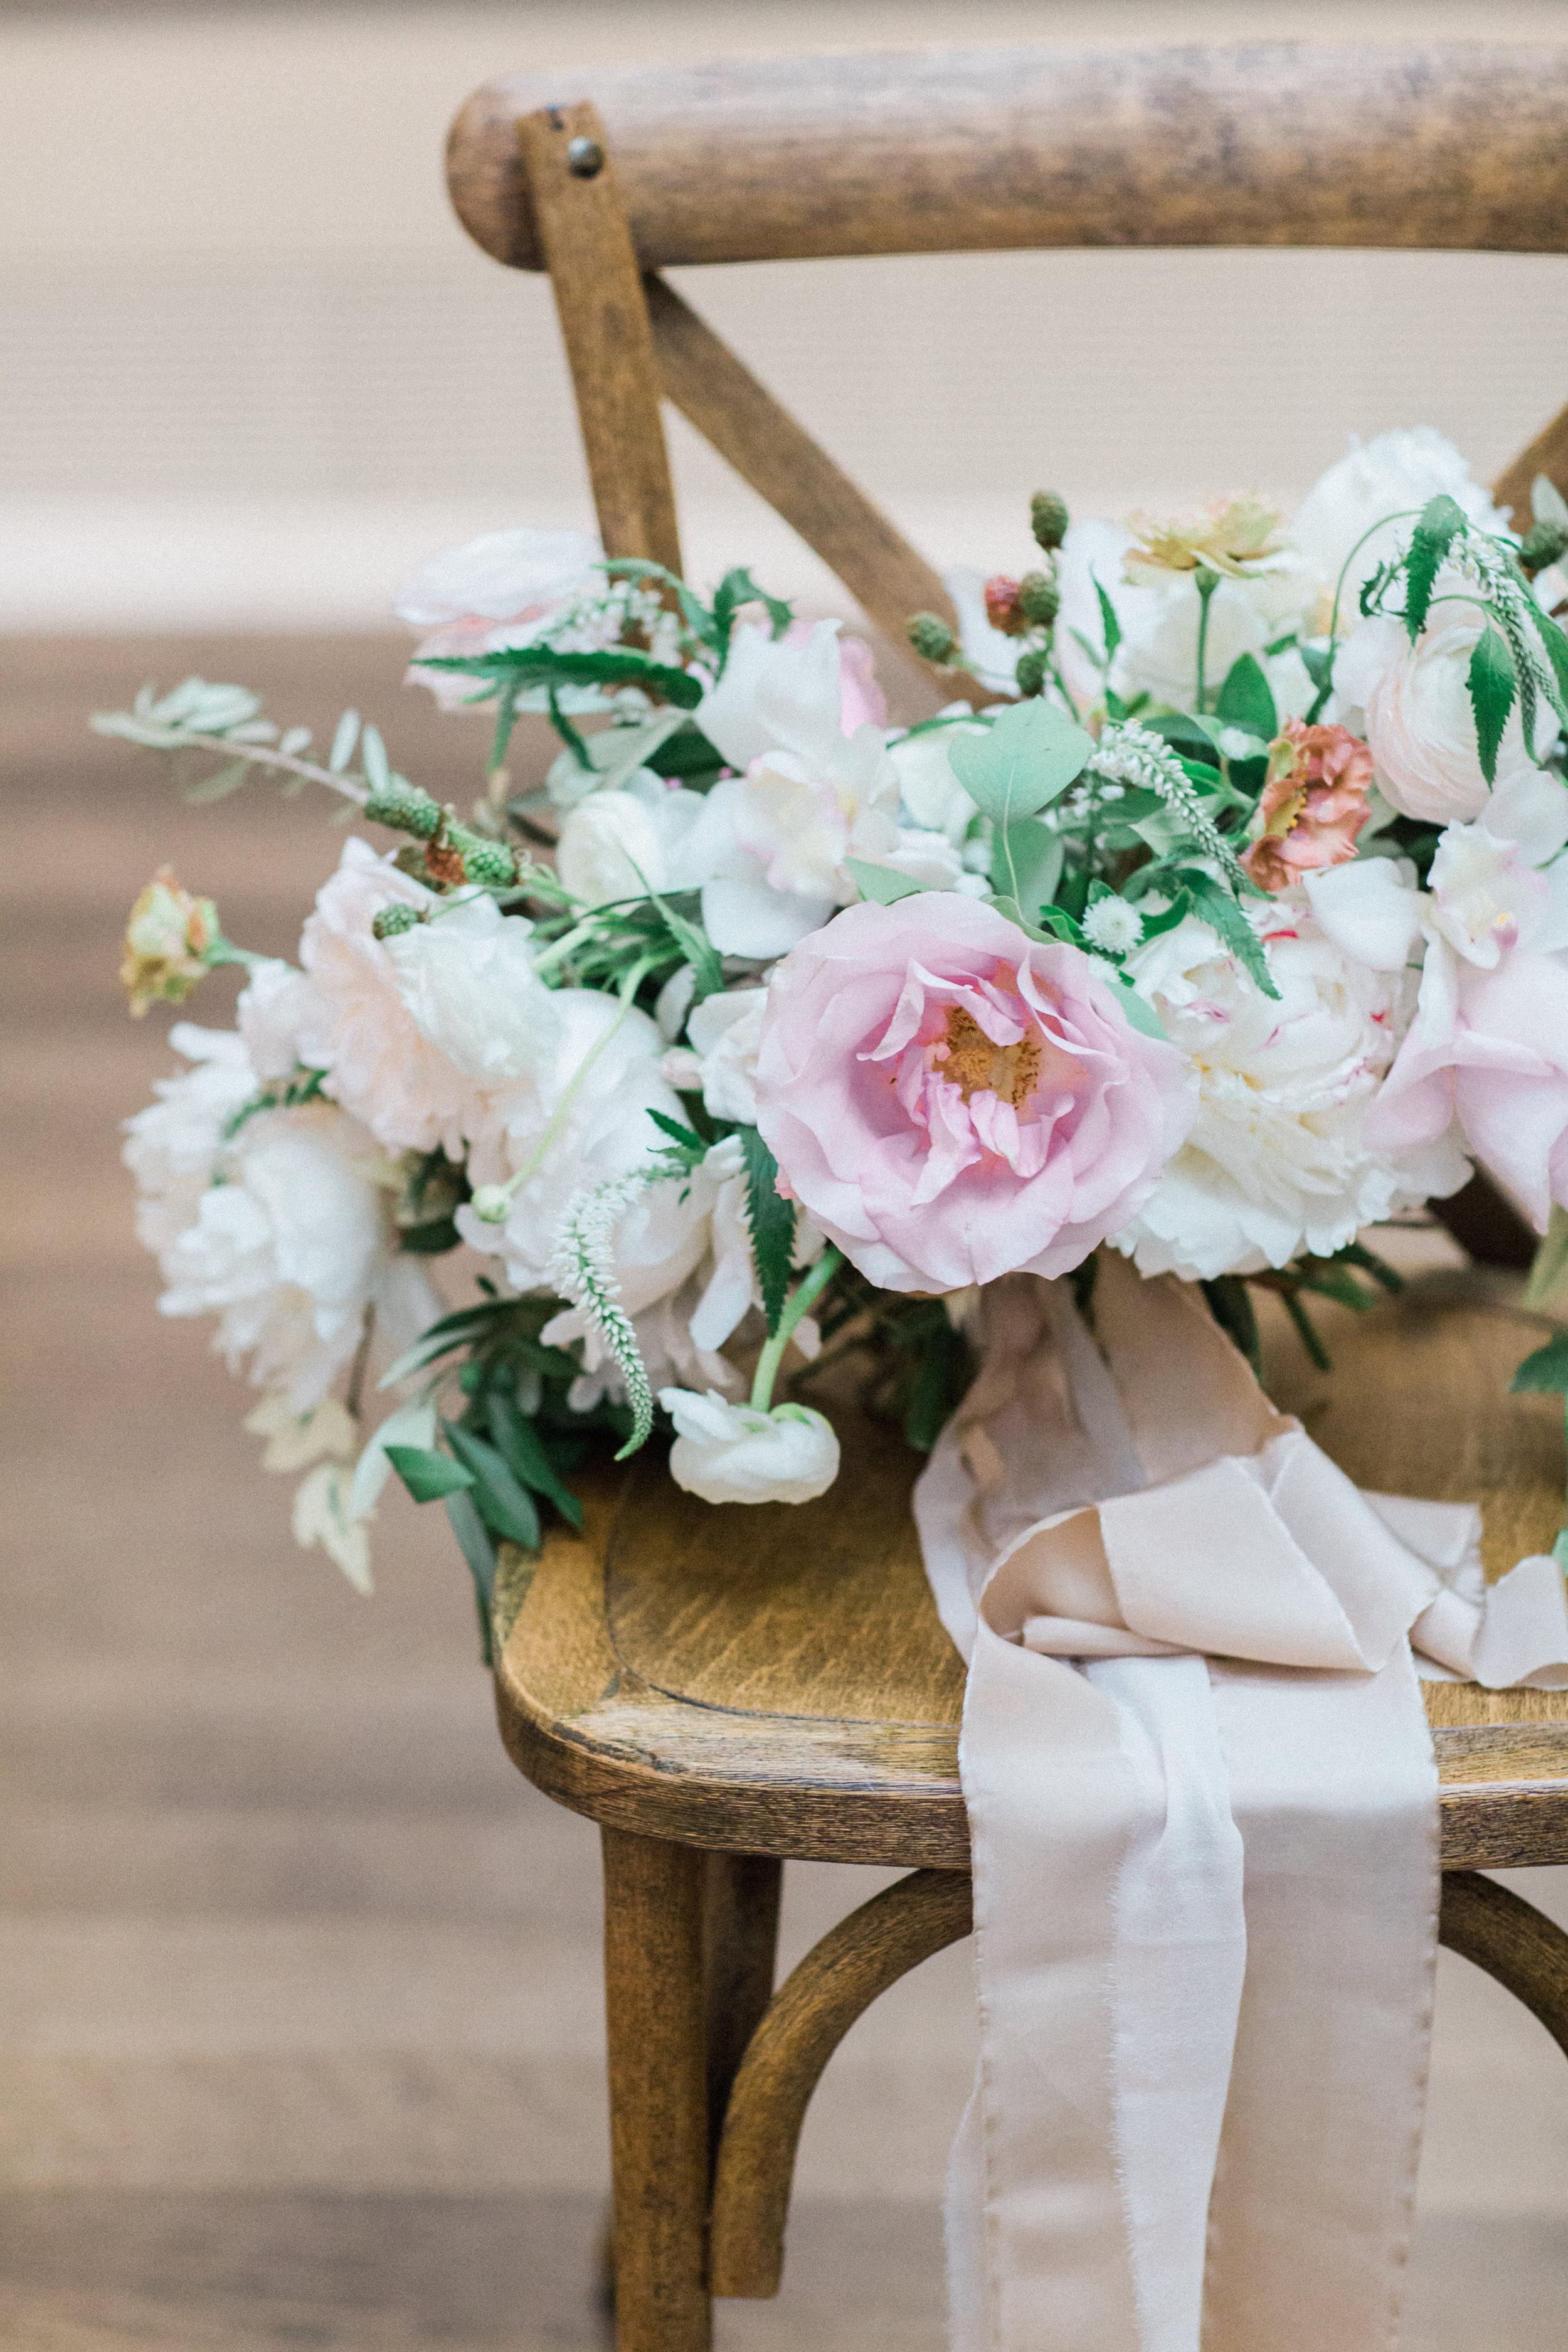 bouquet-romantic-pink-soft-ribbon-silk-detail-photography-floras-by-maxit-flower-design